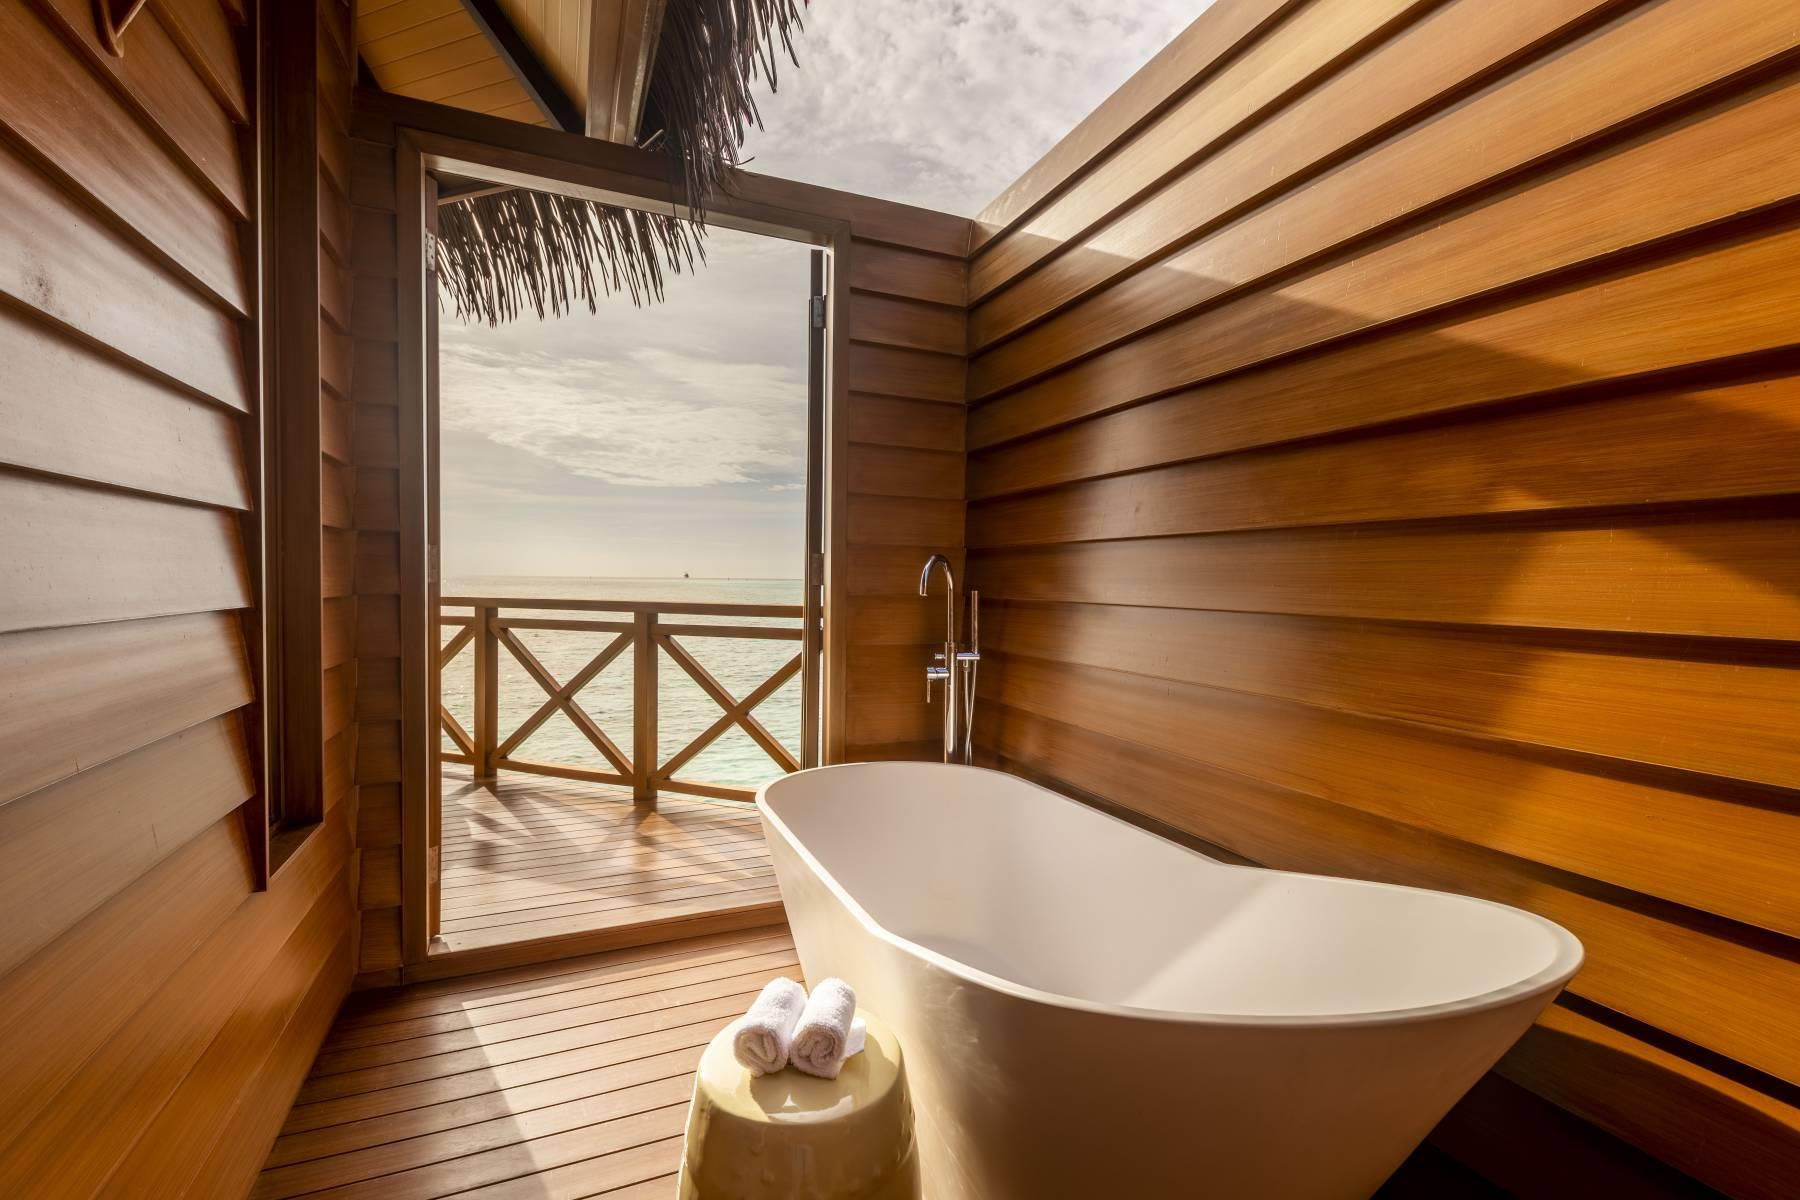 mercure-maldives-kooddoo-resort-genel-0012